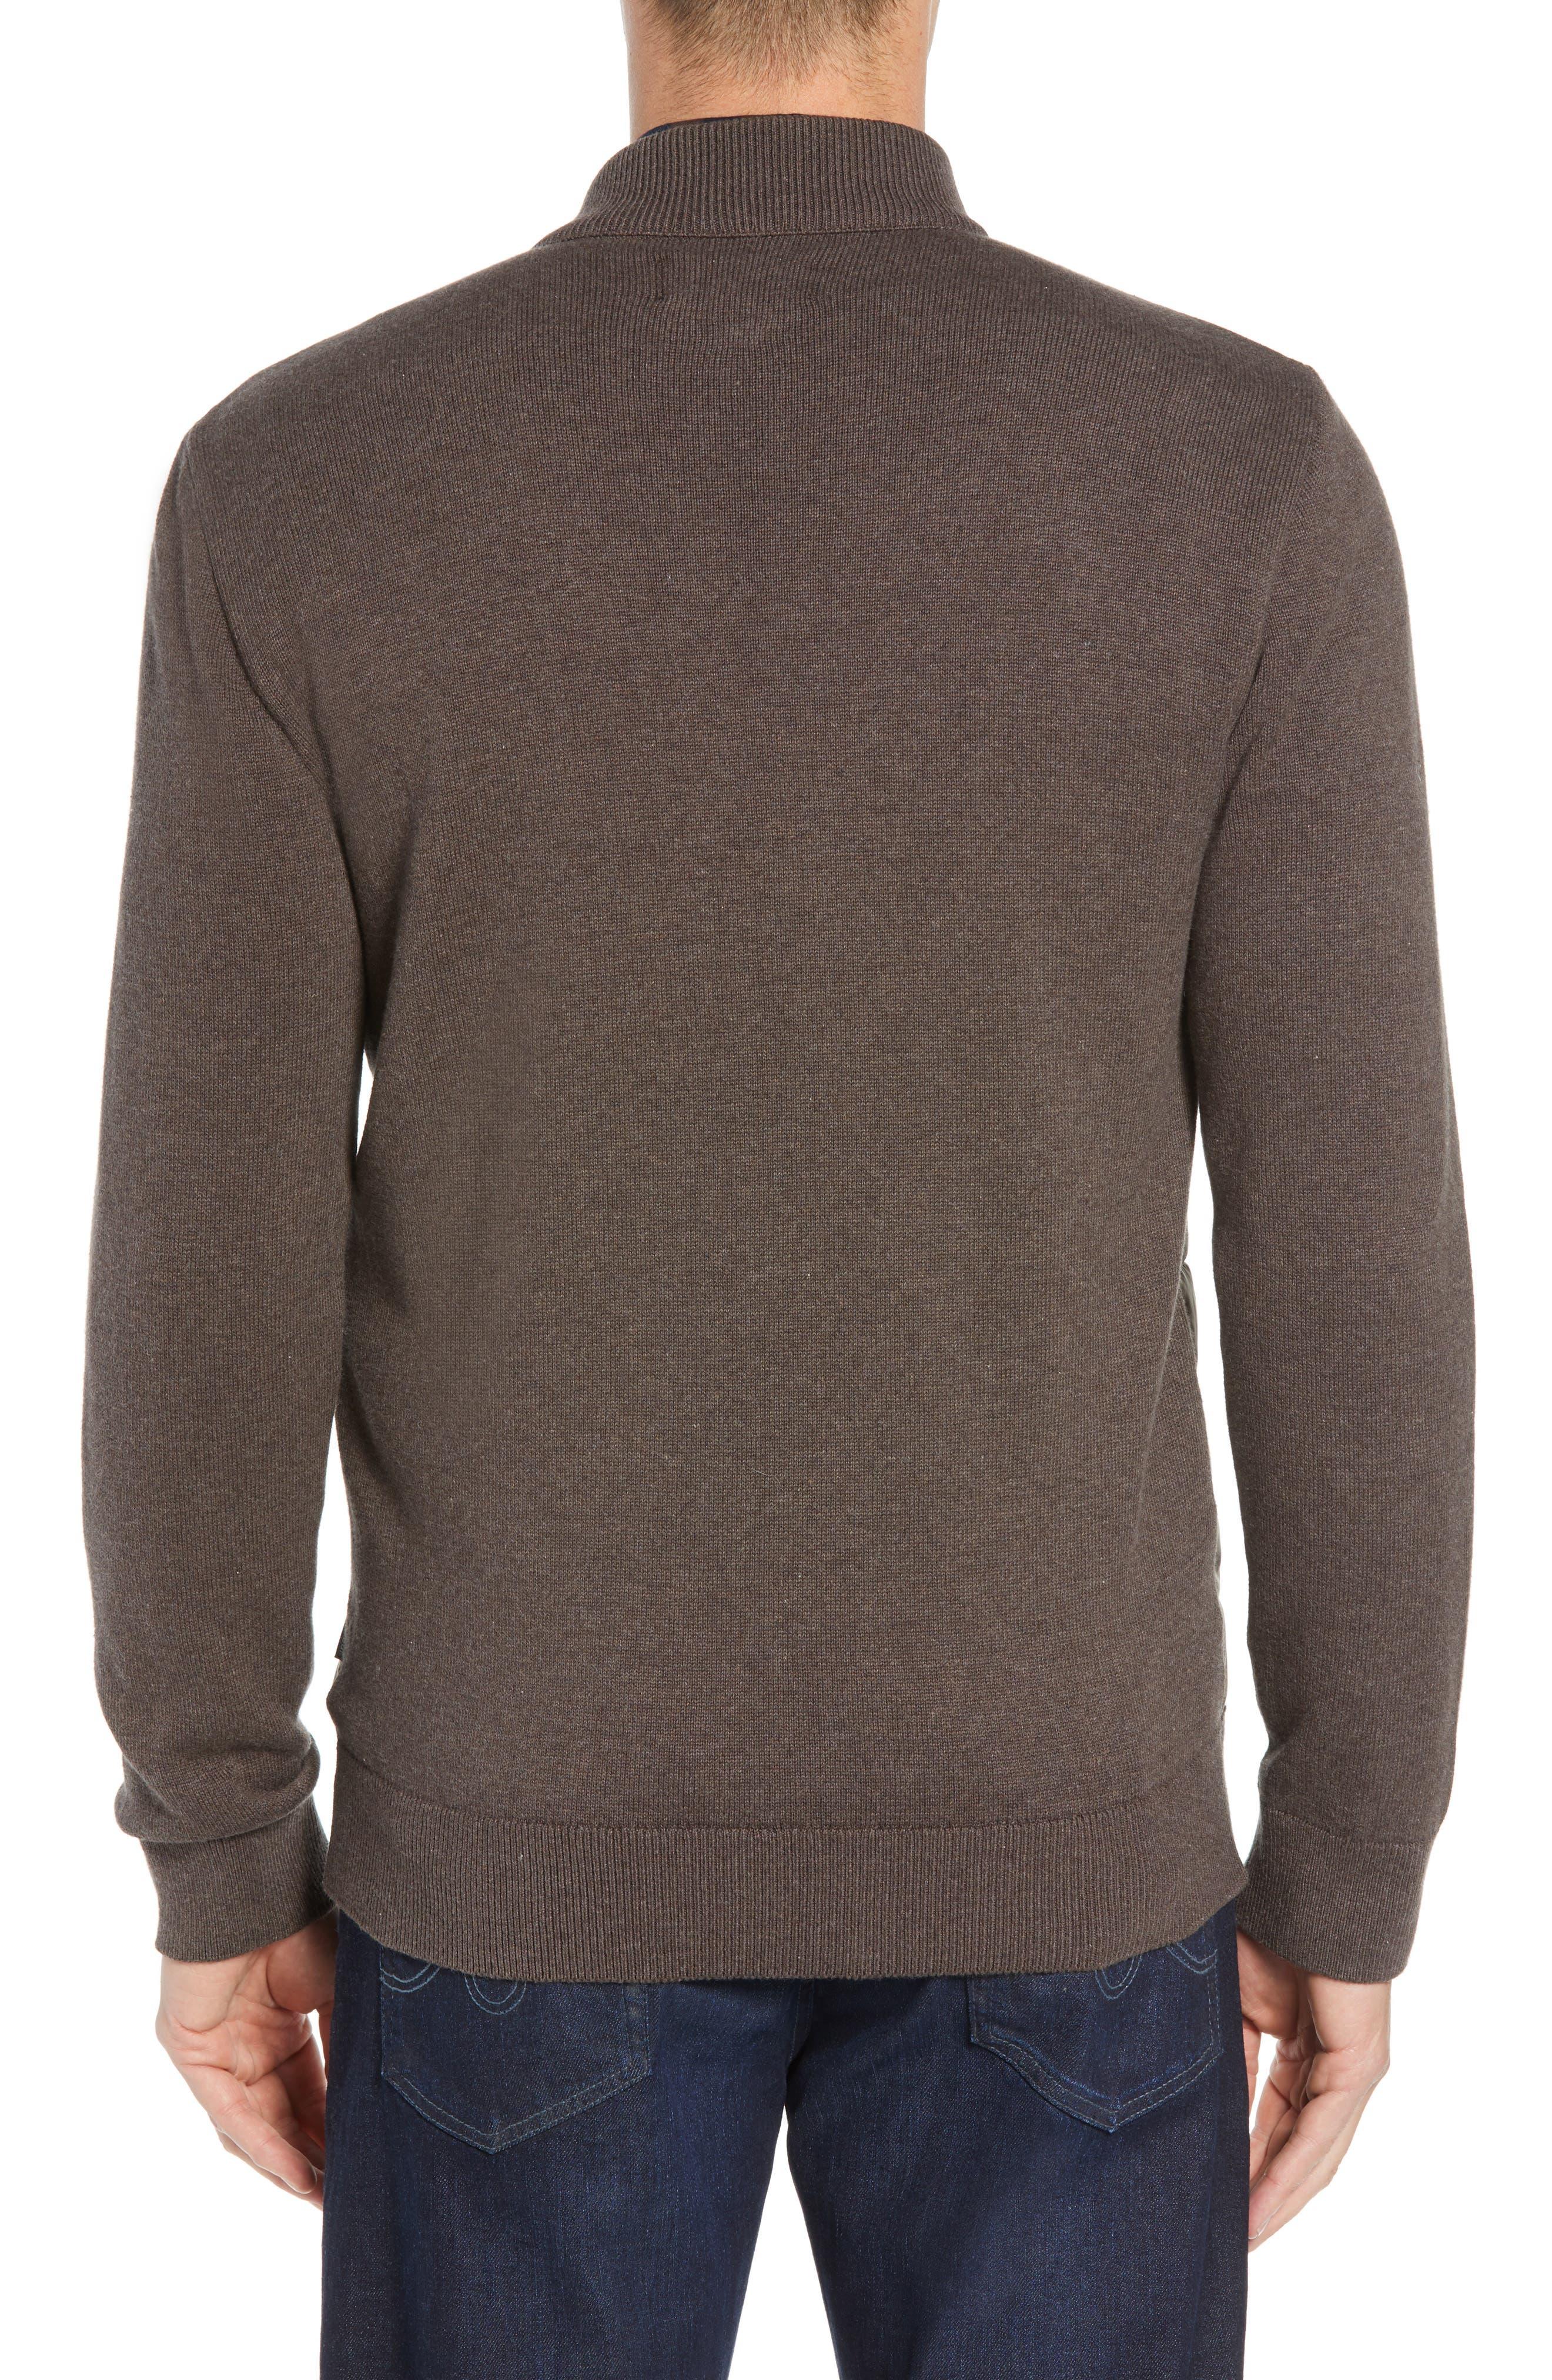 BARBOUR,                             Carn Baffle Front Knit Jacket,                             Alternate thumbnail 2, color,                             250